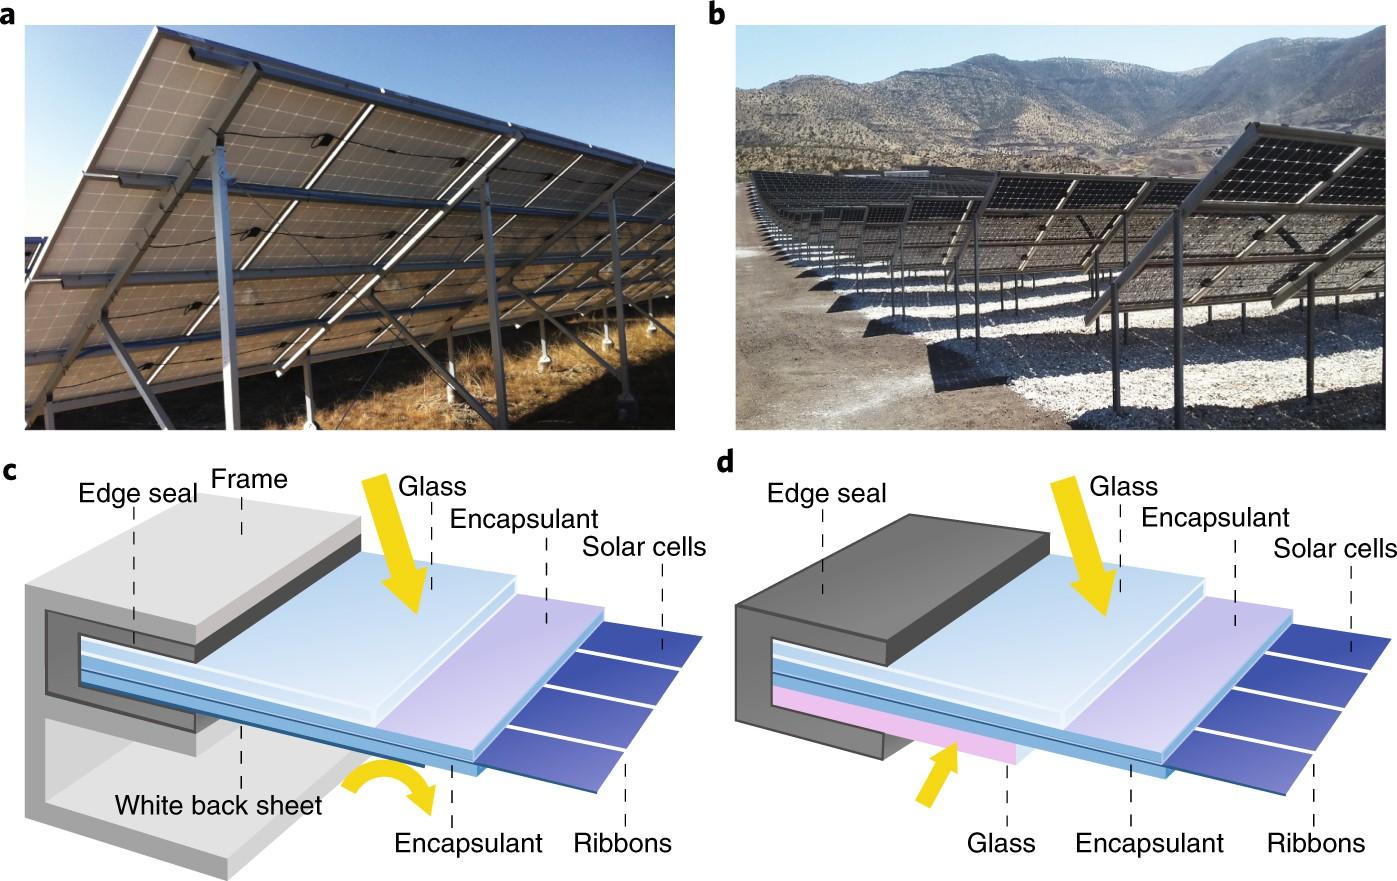 Towards large-scale deployment of bifacial photovoltaics